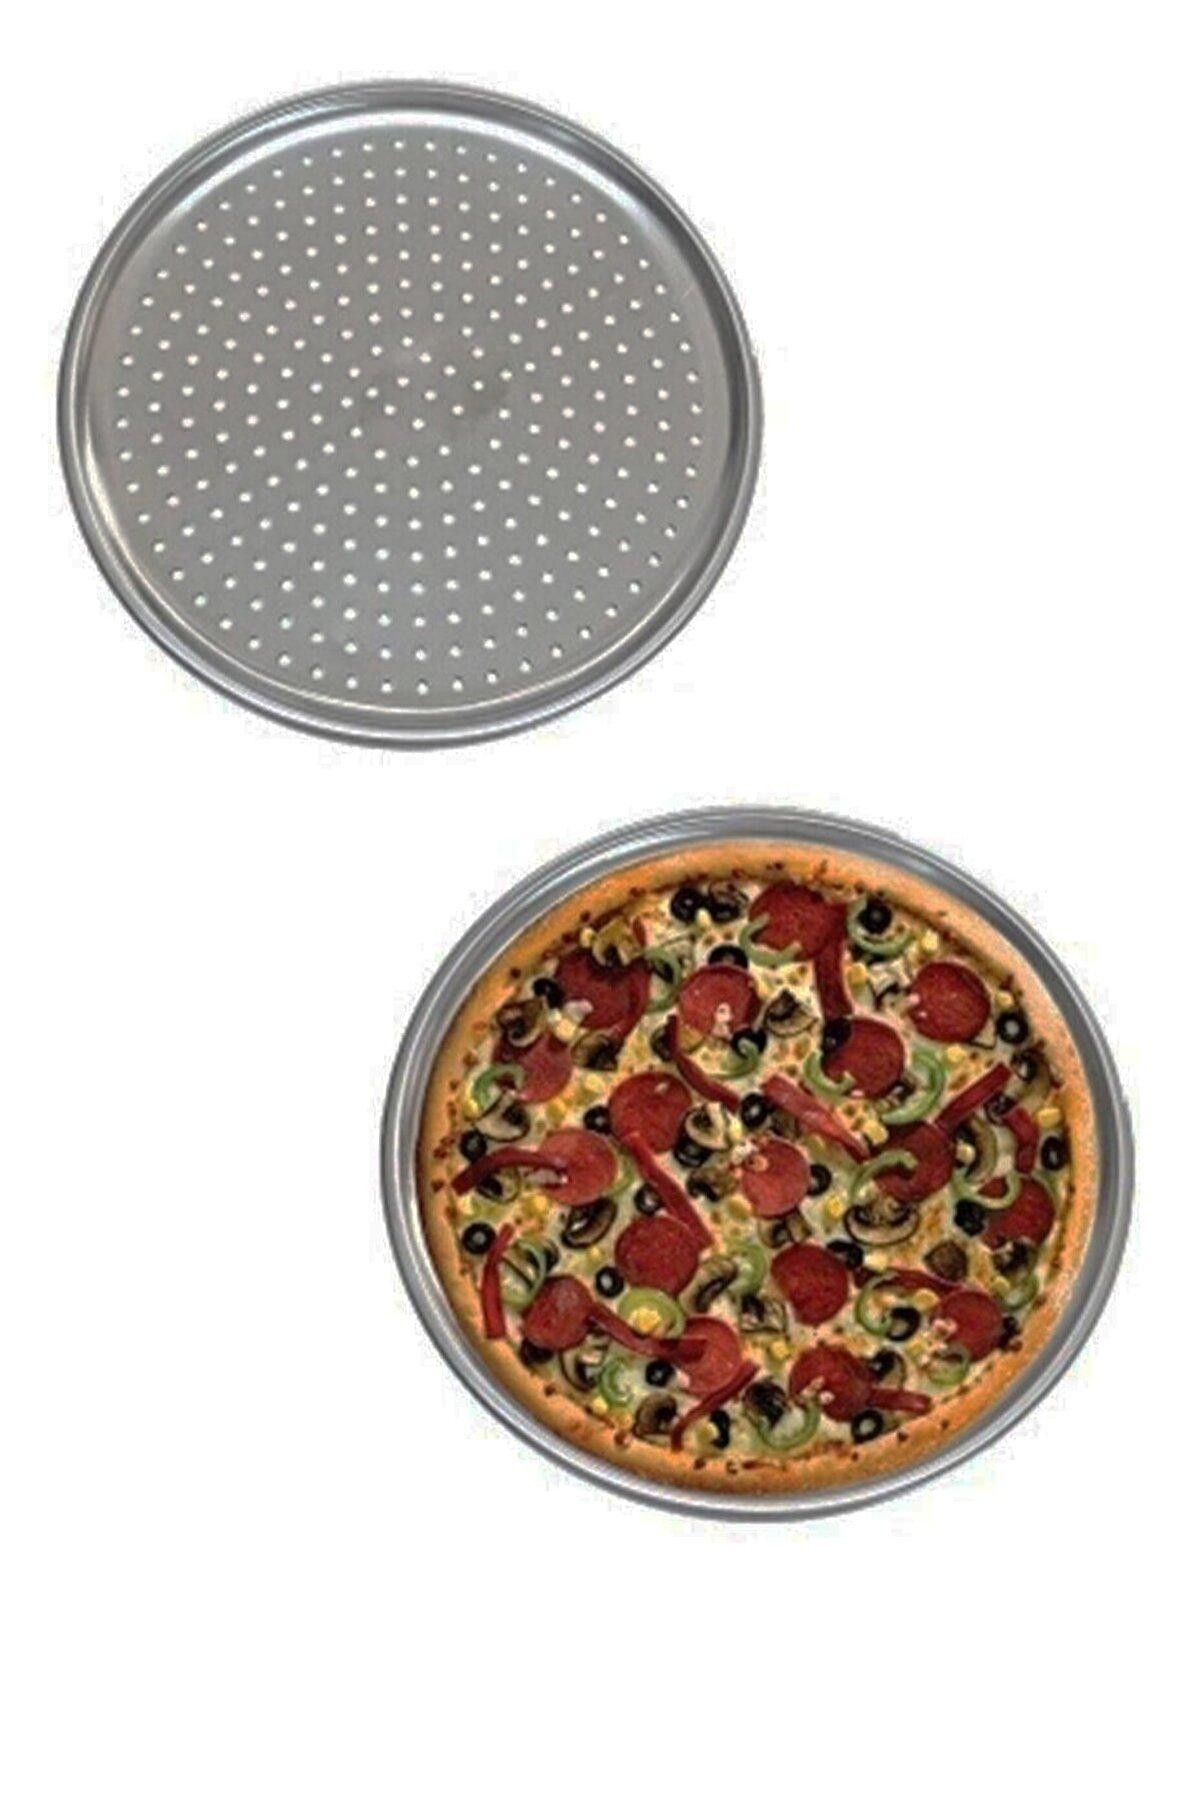 KHAKMA Delikli Pizza Tepsisi Lahmacun Pide Tepsisi 32cm 2 Adet